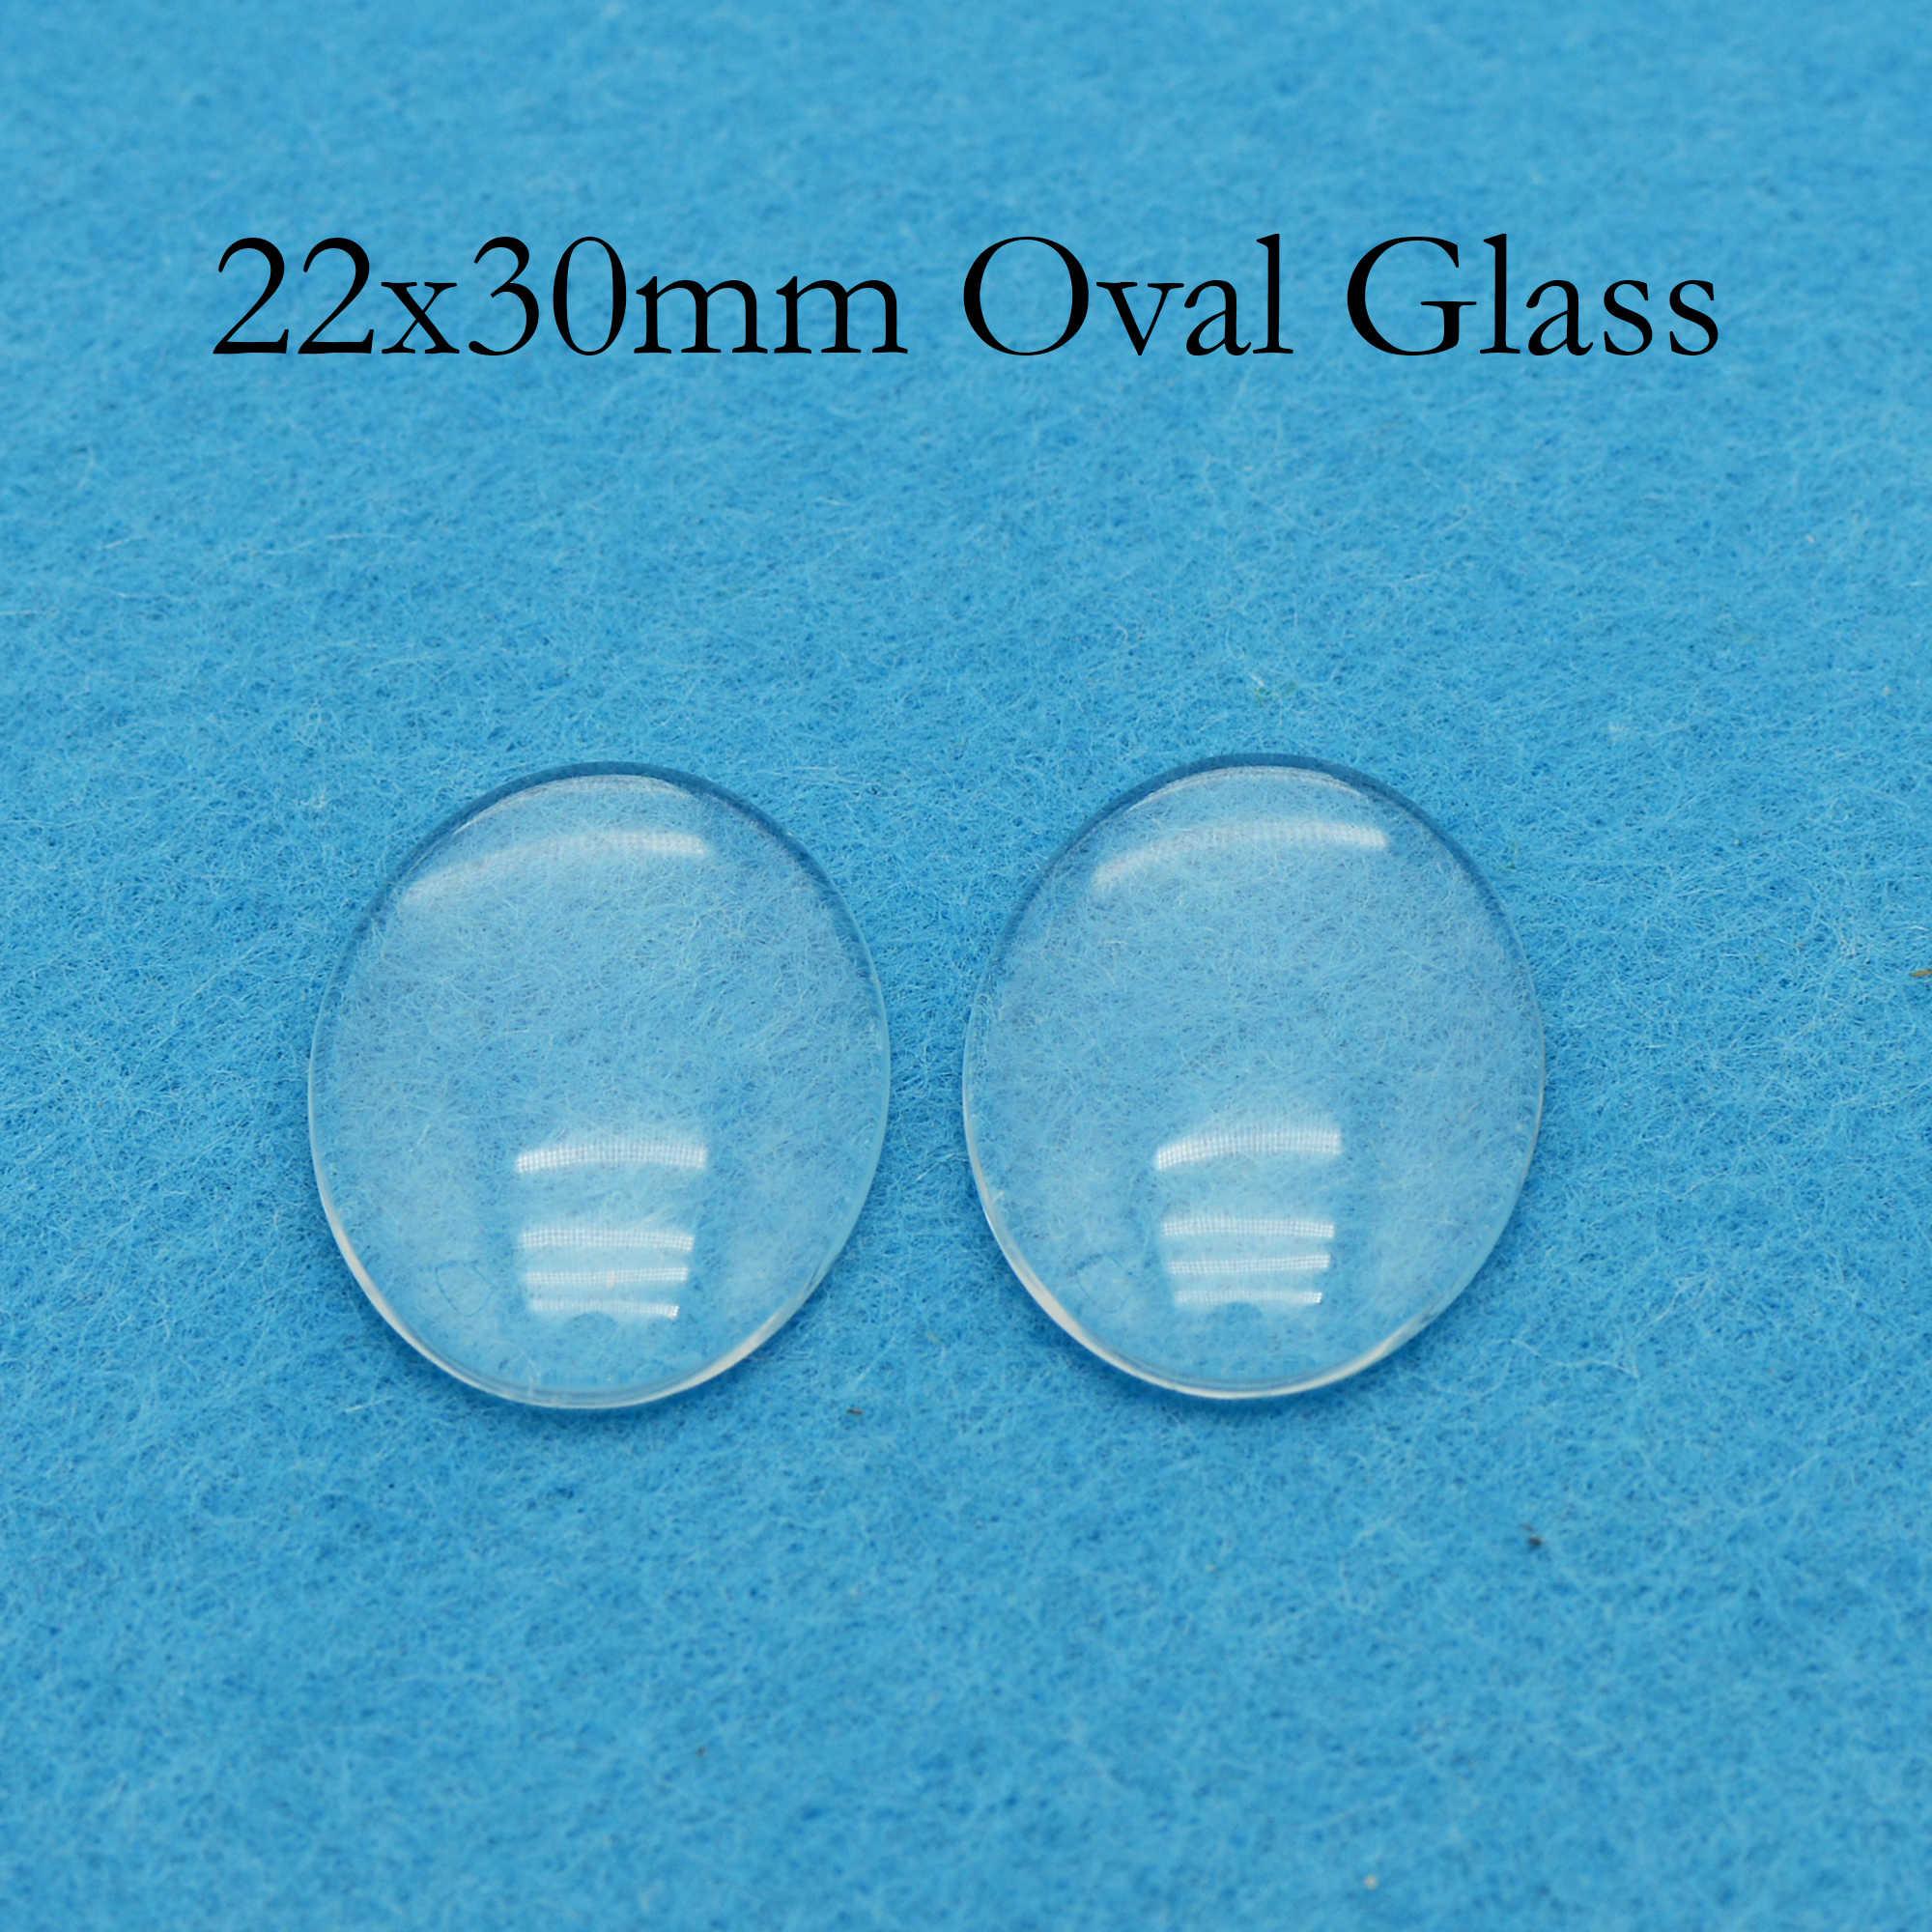 4pcs 18x25mm Oval Handmade Photo Glass Cabochons 15-7 4 pcs 10x14mm,13x18mm,18x25mm,20x30mm,30x40mm Oval Glass Cabochons